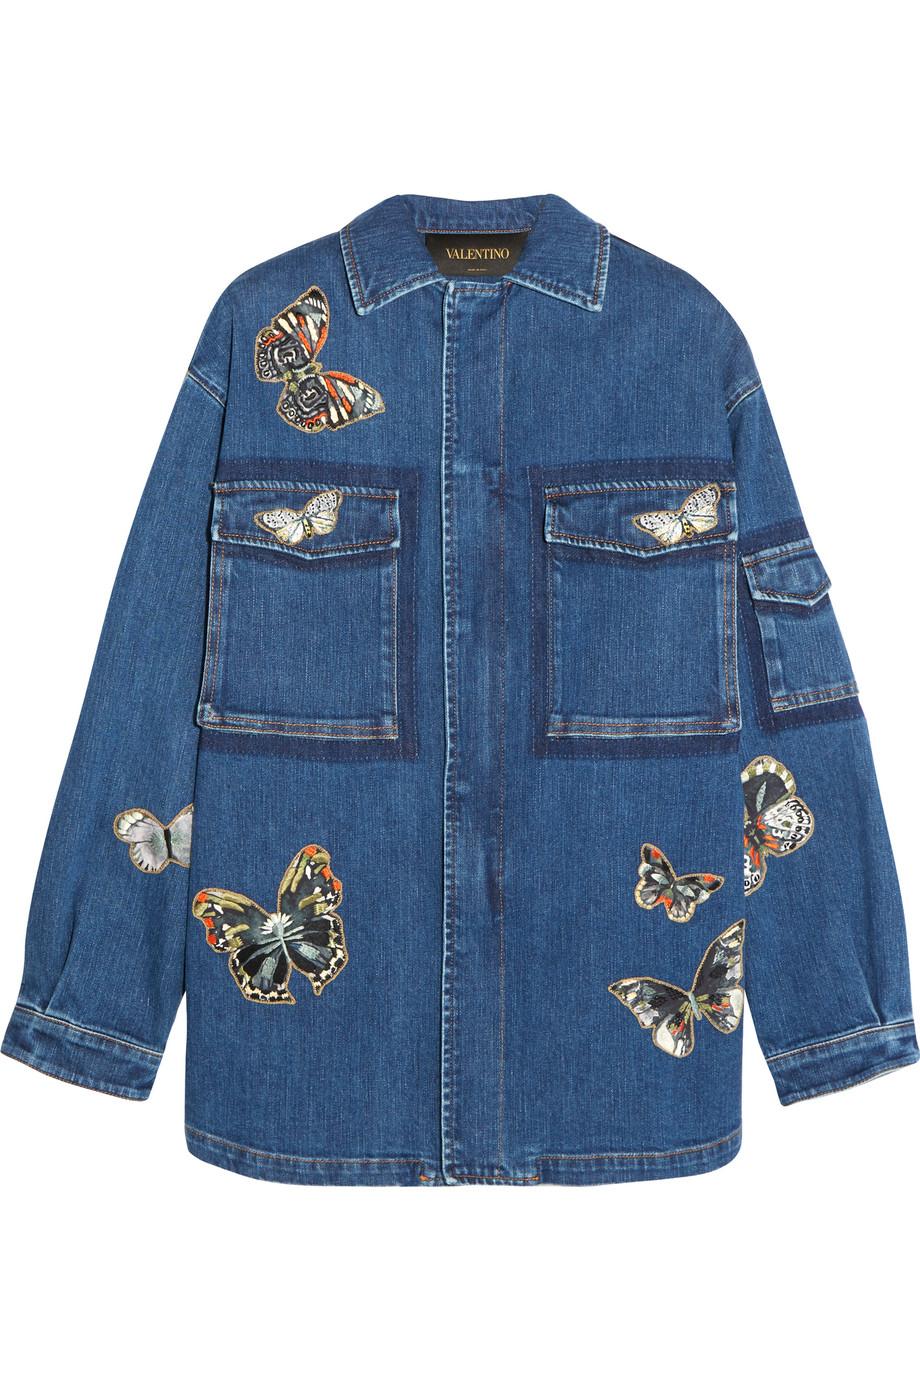 Valentino Butterfly-Appliquéd Stretch-Denim Jacket, Size: 42